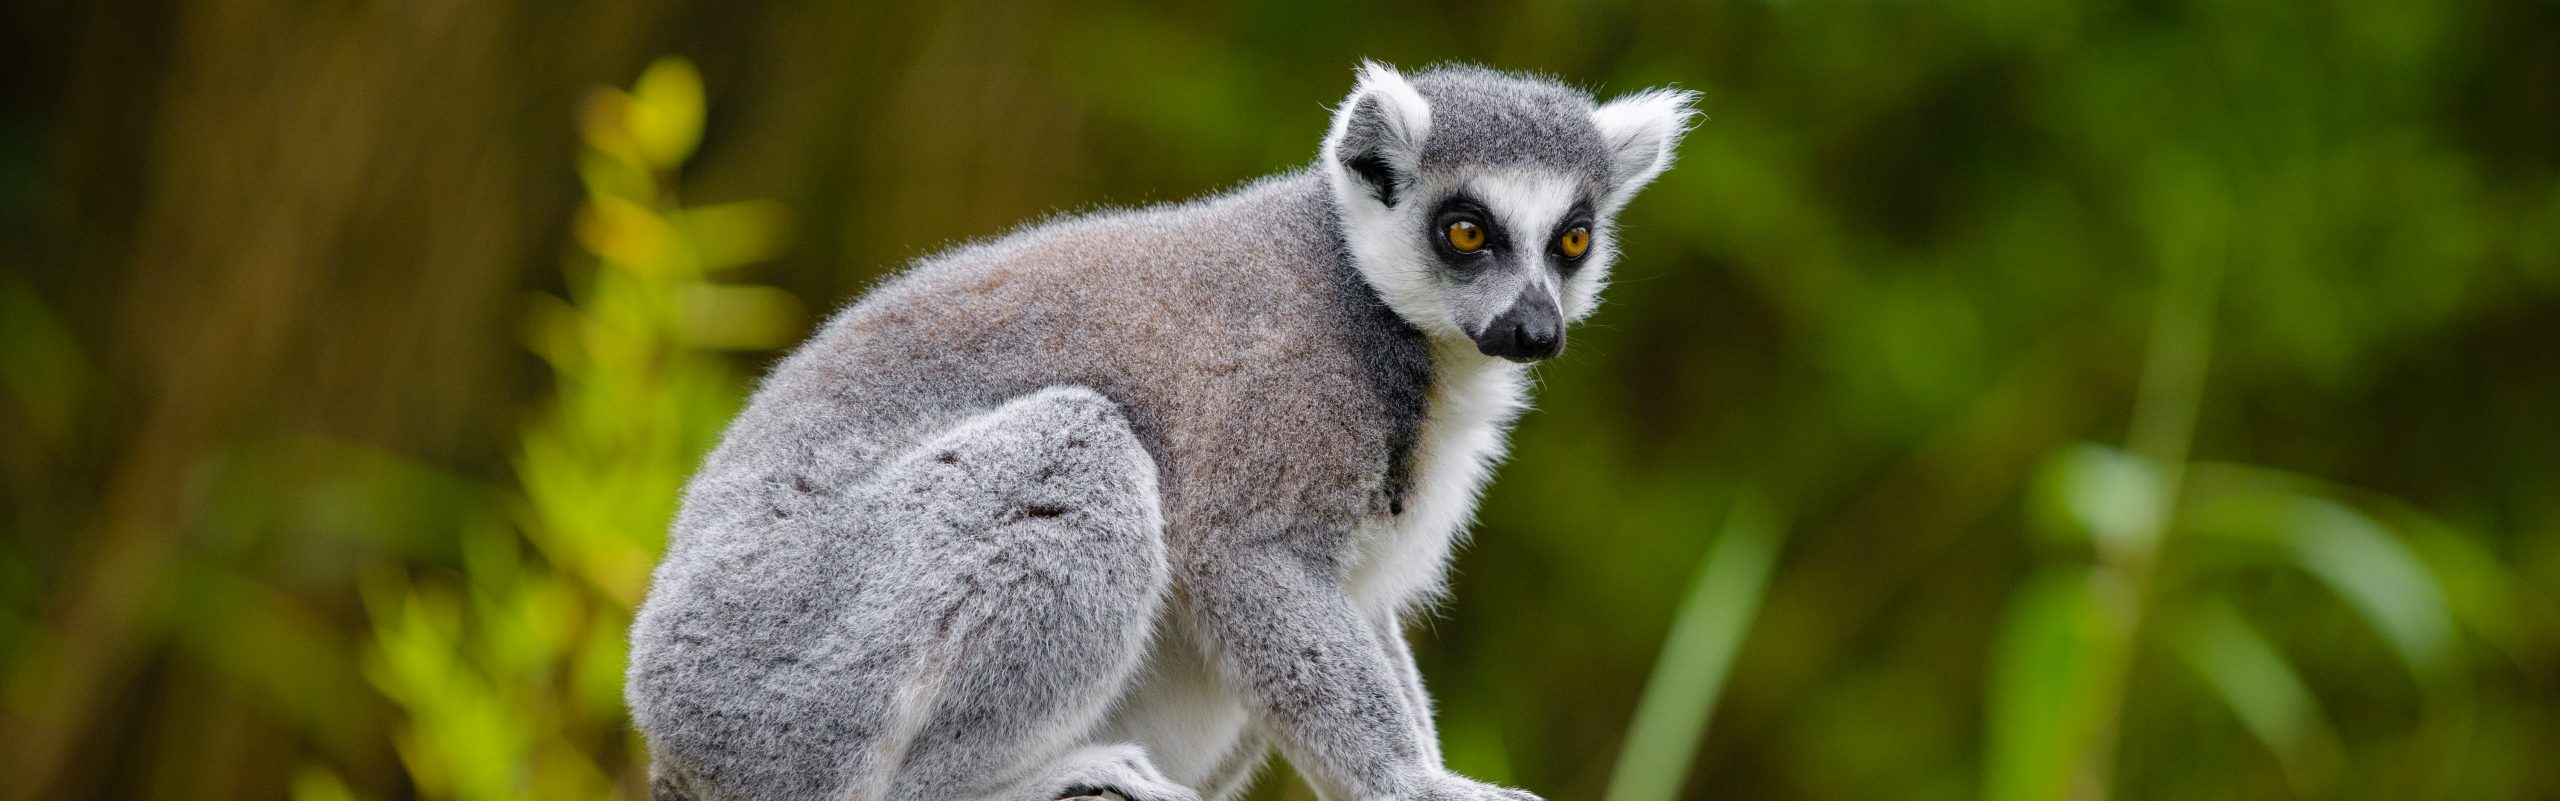 https://faunafocus.com/home/november-2018-ring-tailed-lemur/#jp-carousel-11946